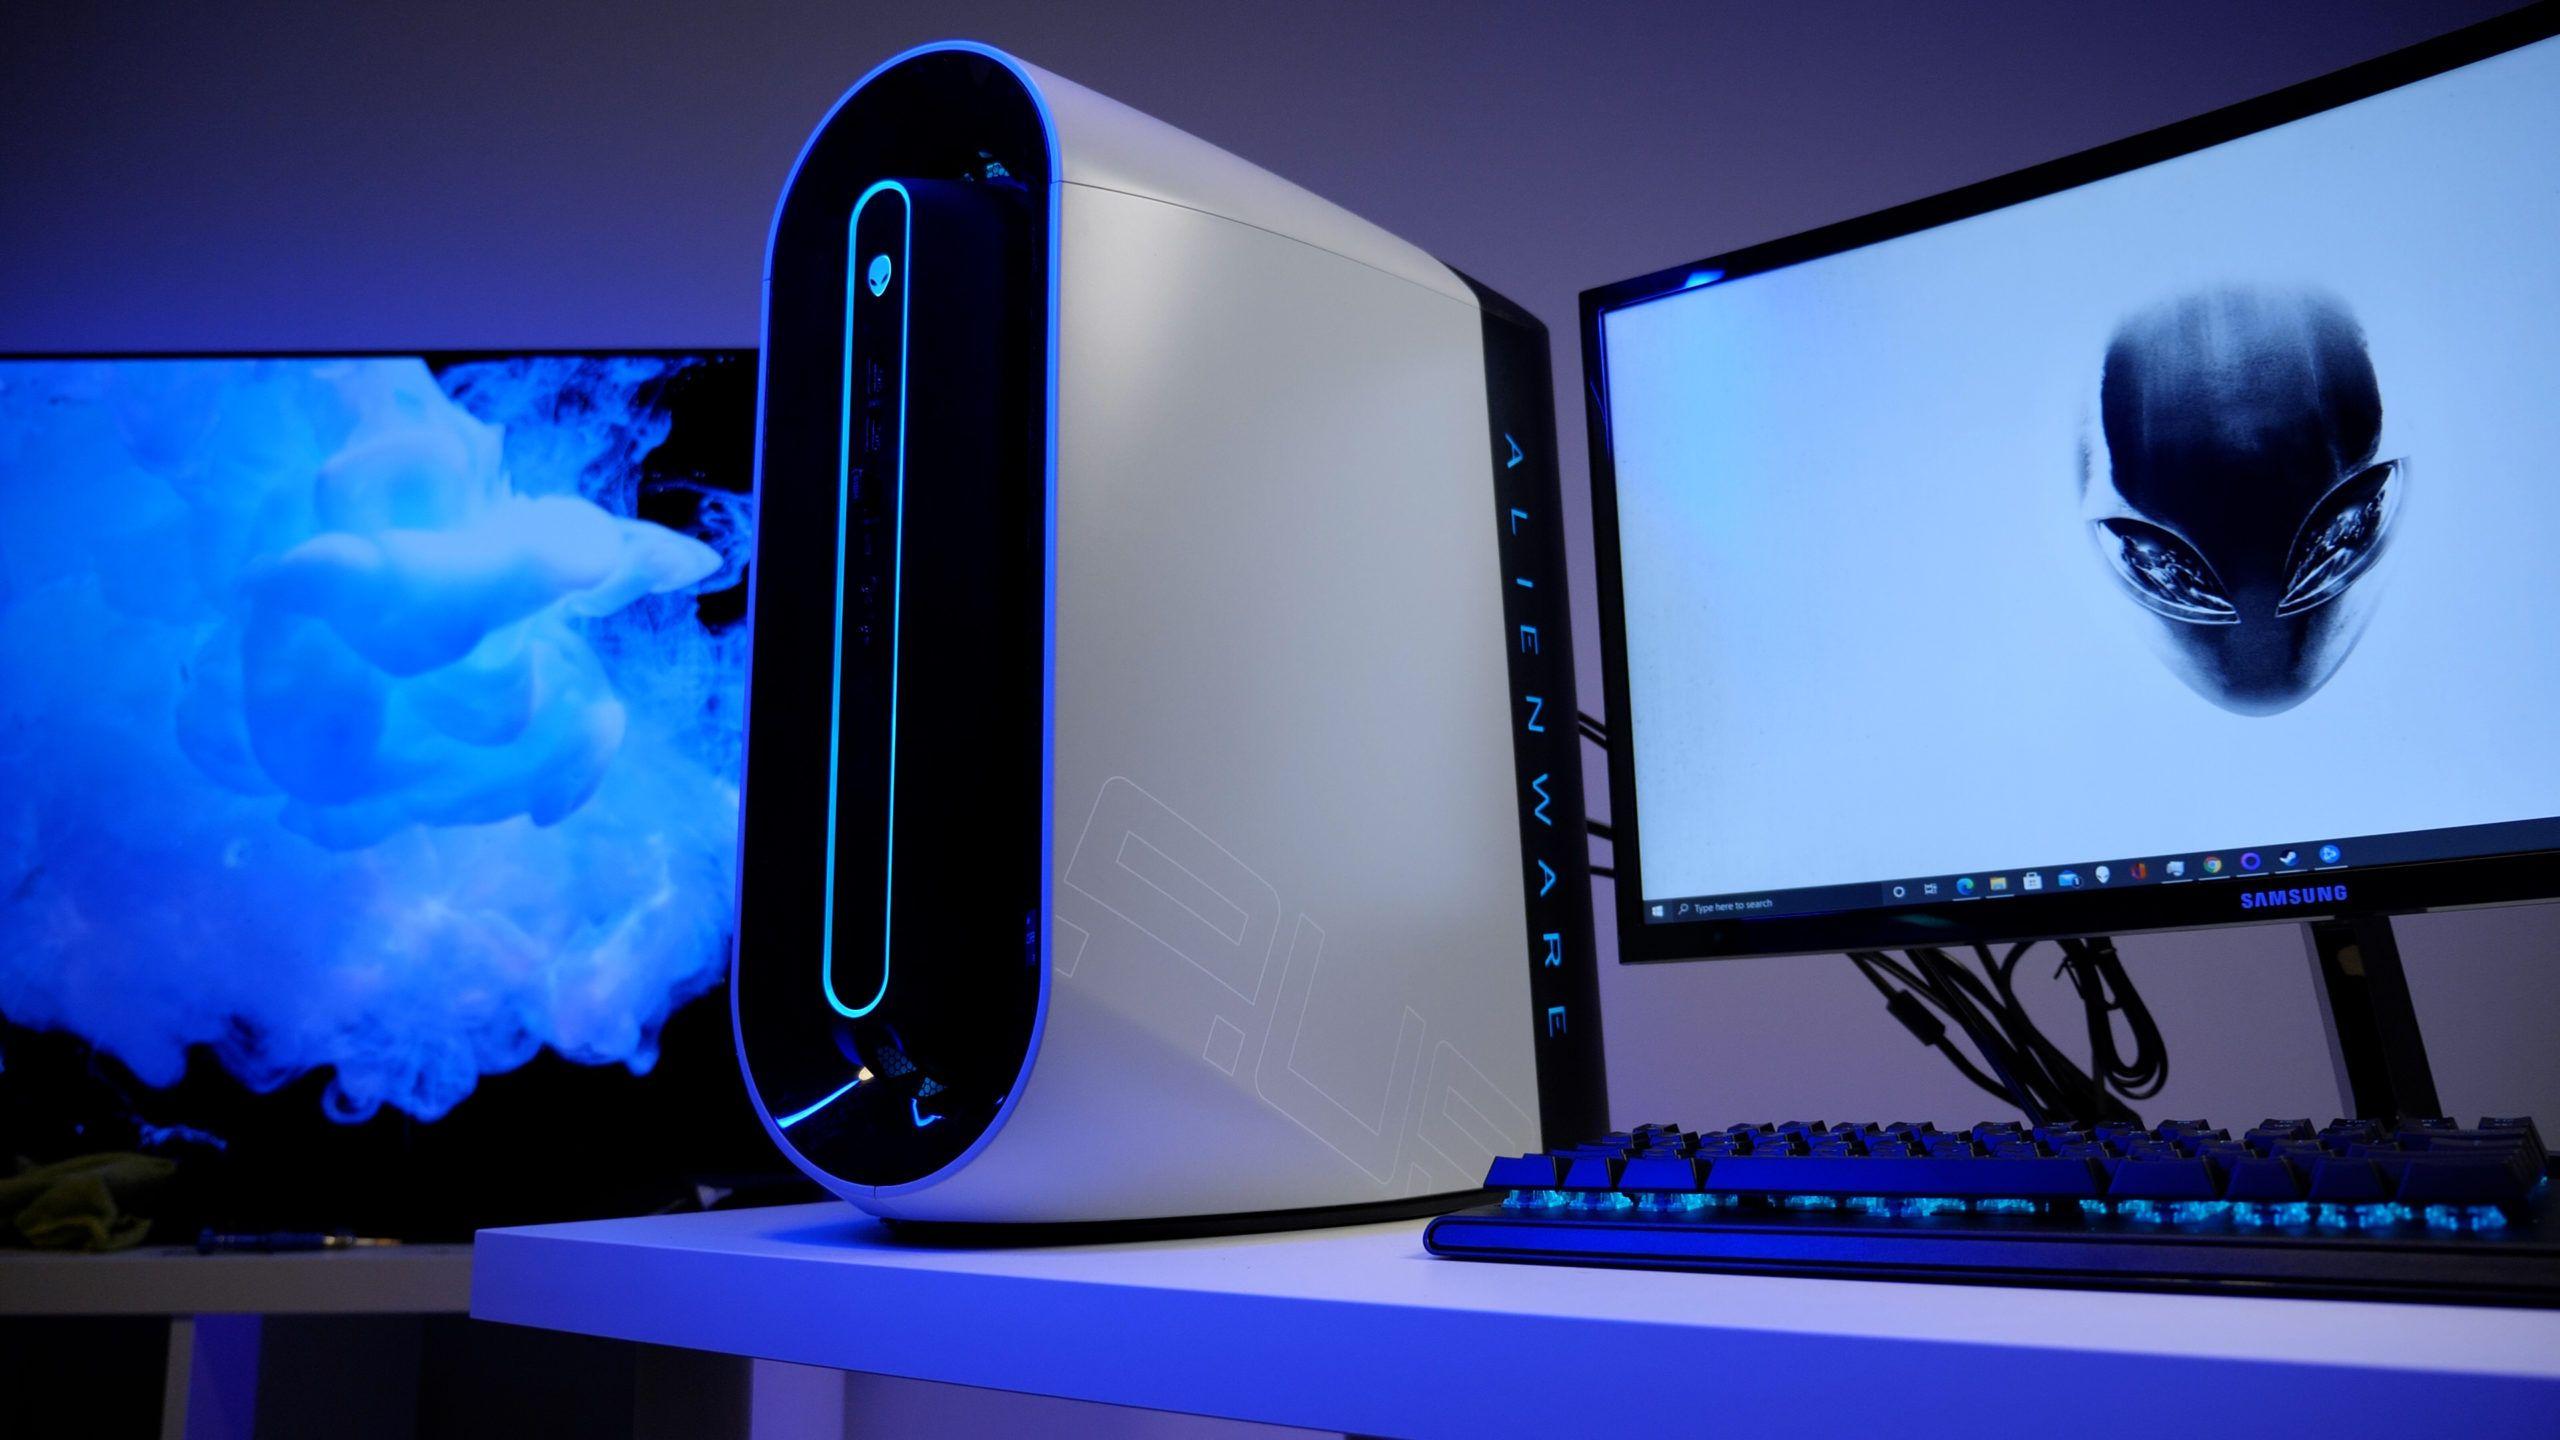 Alienware R12 Full Setup scaled - Alienware Aurora R12 Review